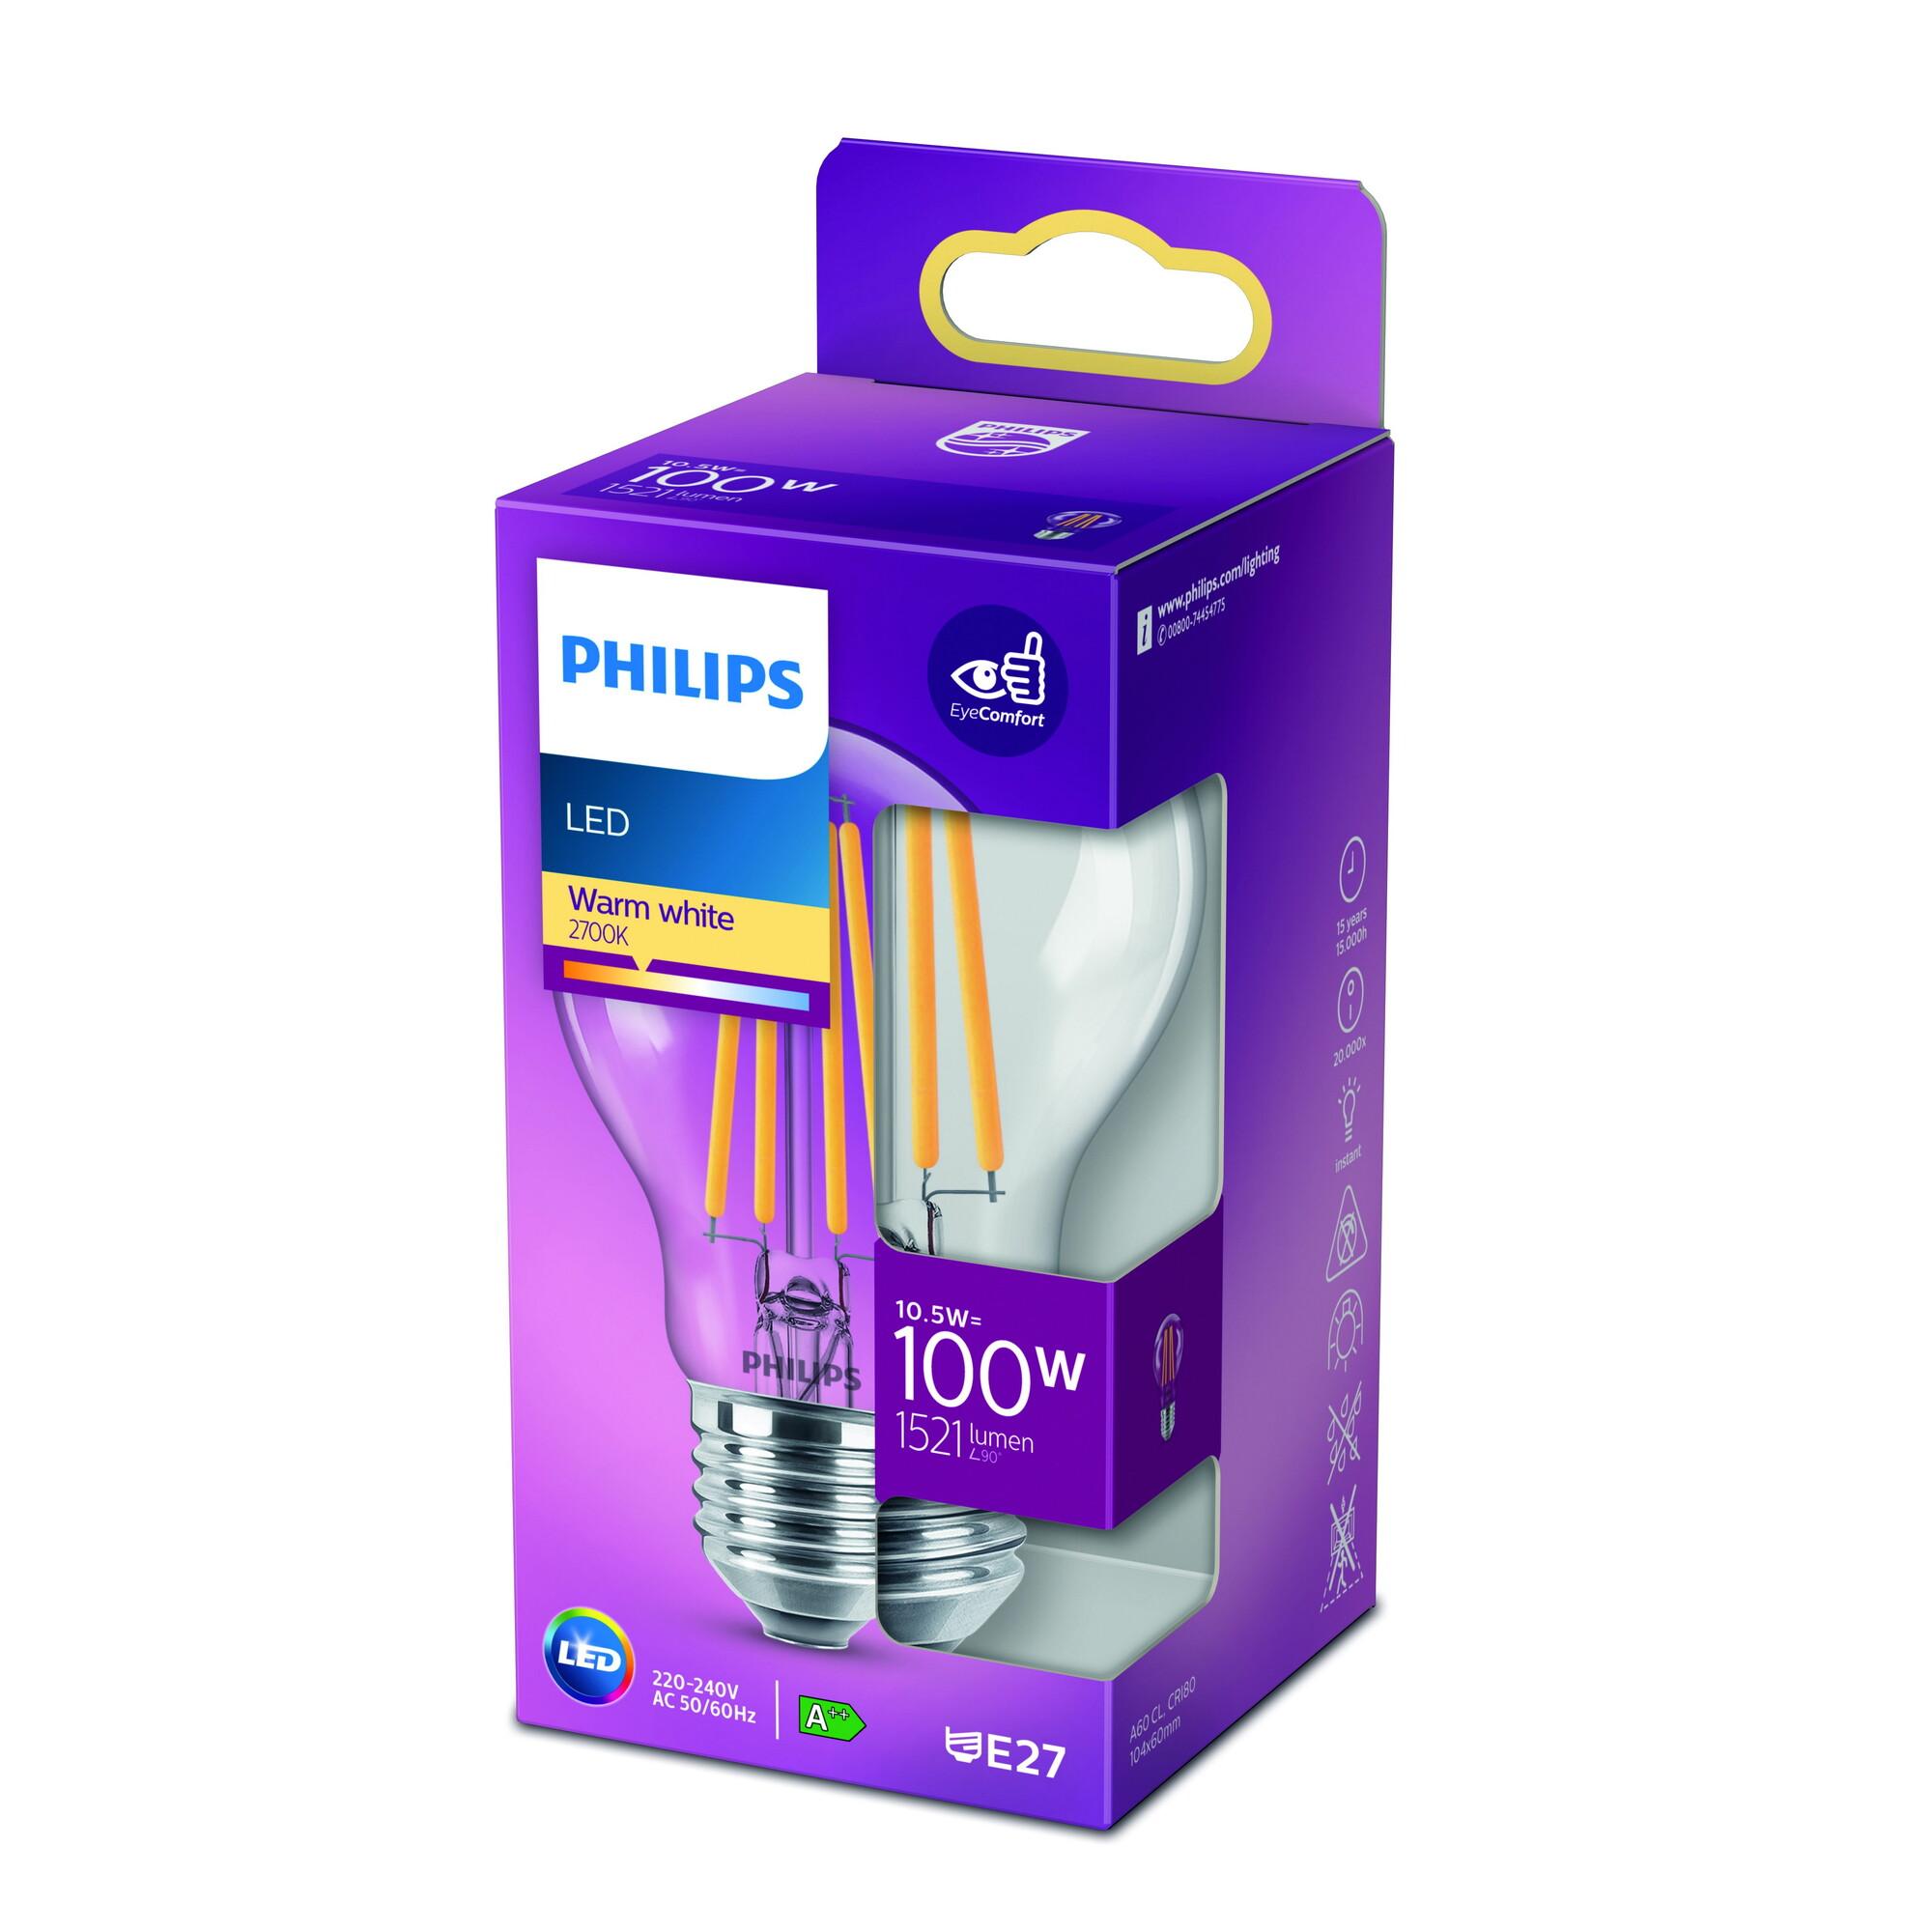 Philips LED classic E27 10,5W 1521lm 2700K Lamp Transparant